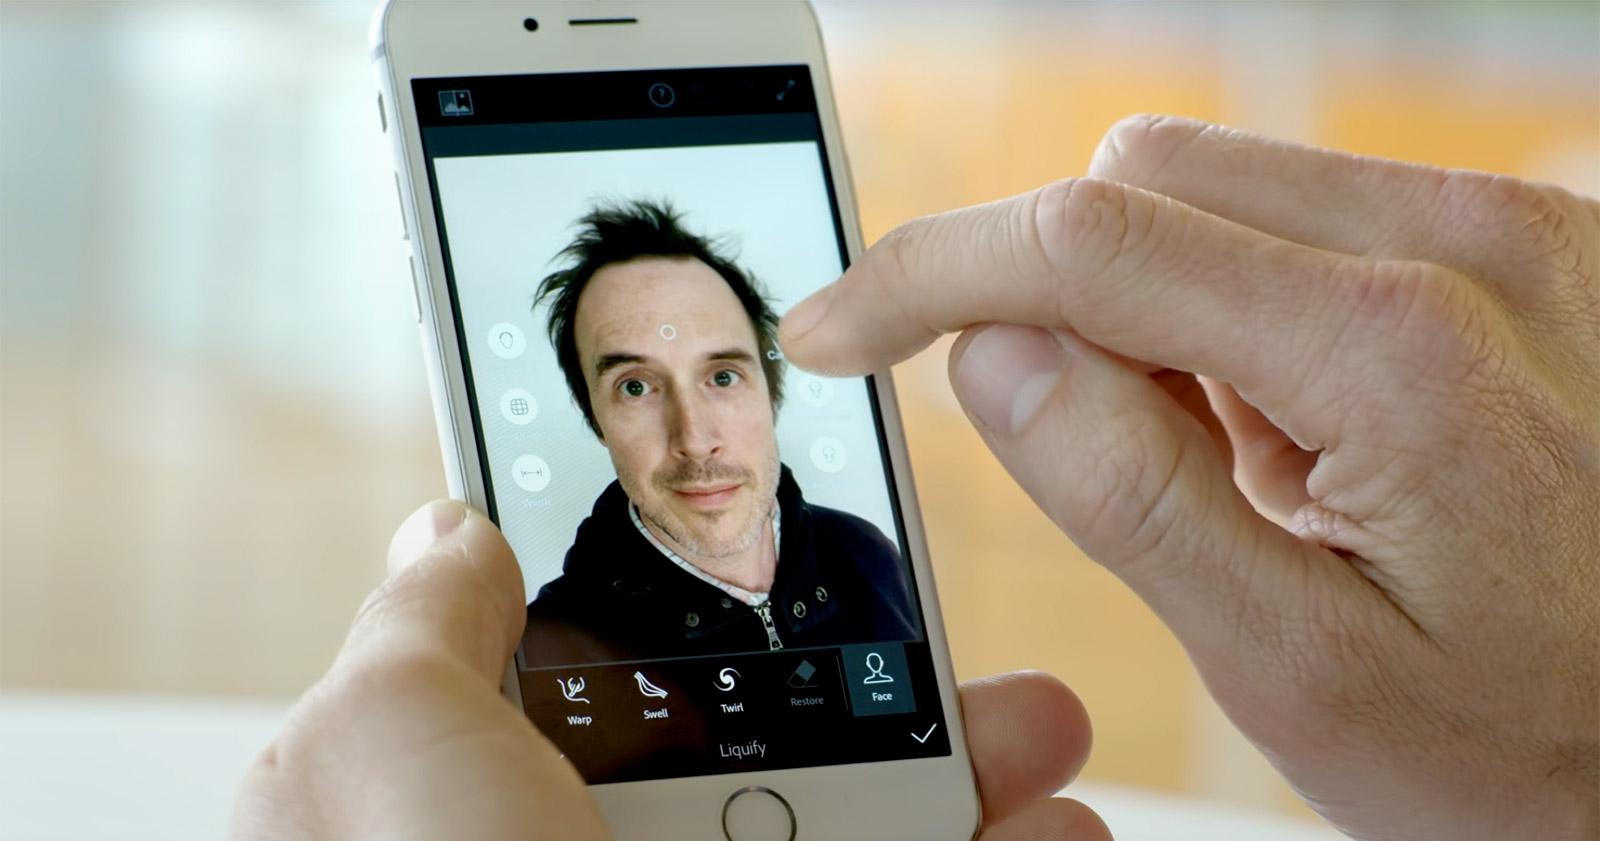 Adobe veut améliorer vos Selfies